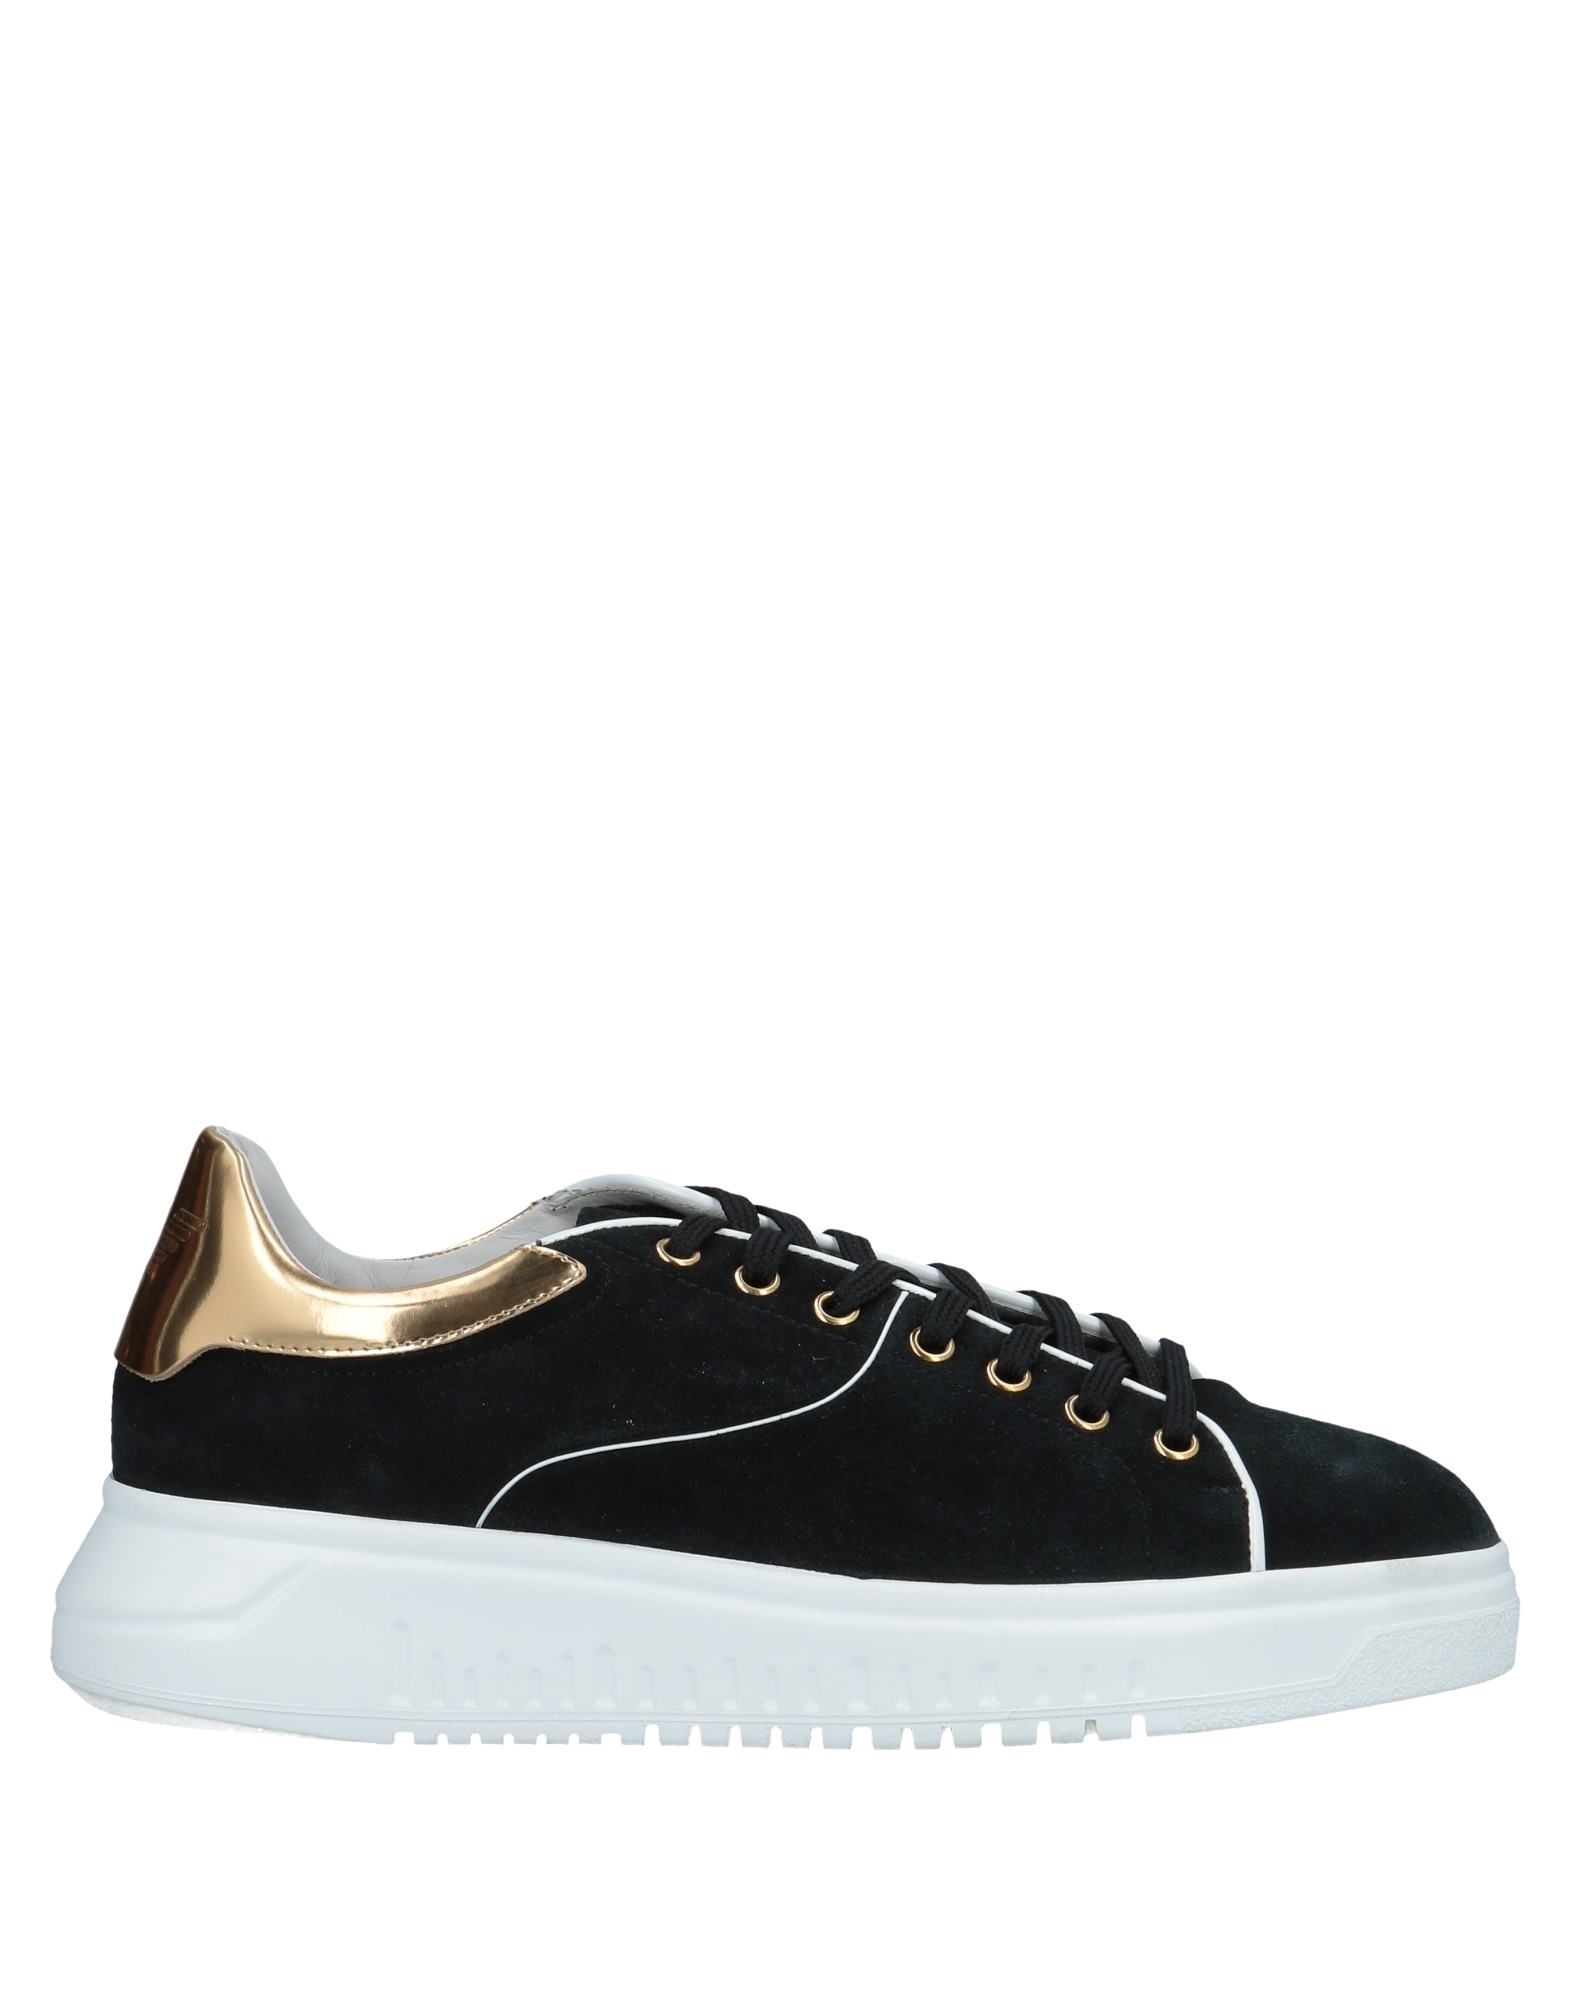 Emporio on Armani Sneakers - Women Emporio Armani Sneakers online on Emporio  Australia - 11550191FN e012dc